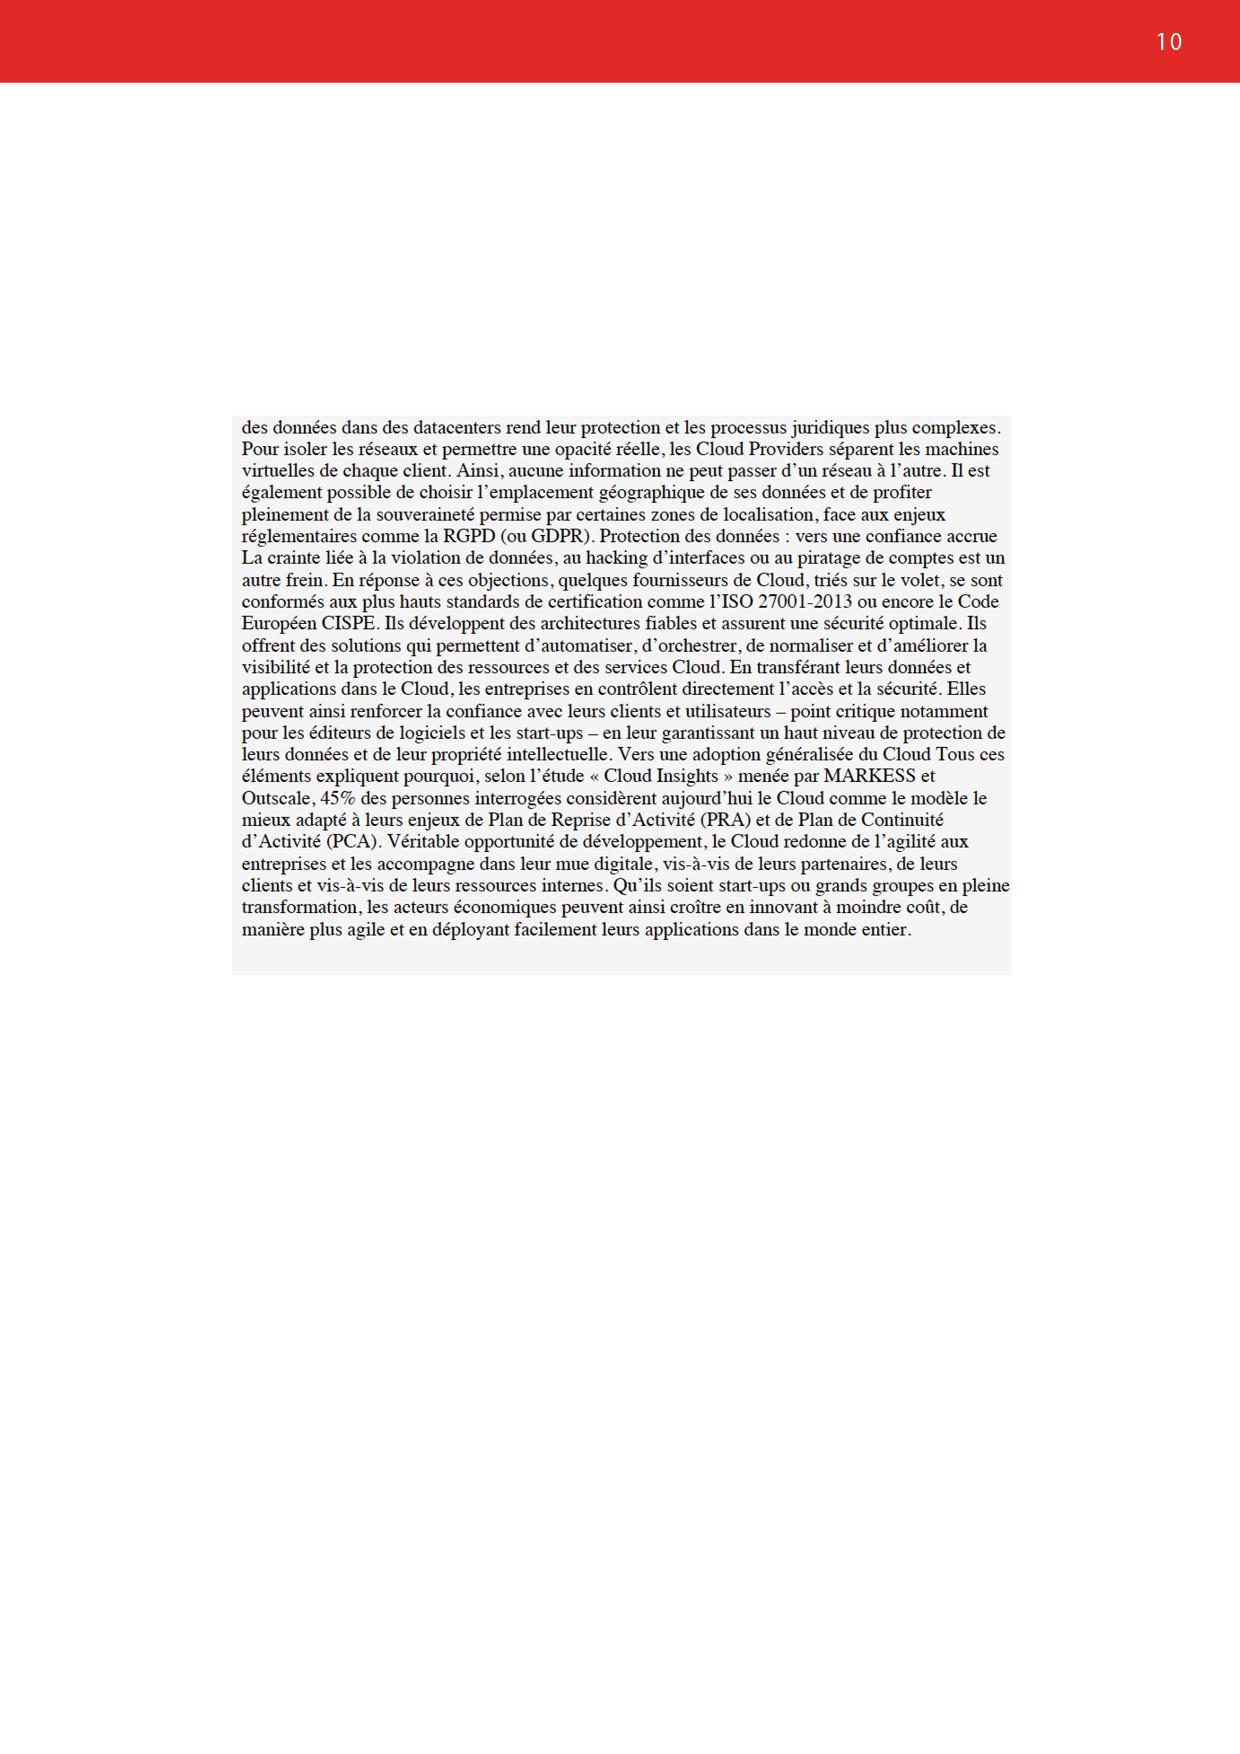 BOOKMEDIA_JAOUT_010.jpg